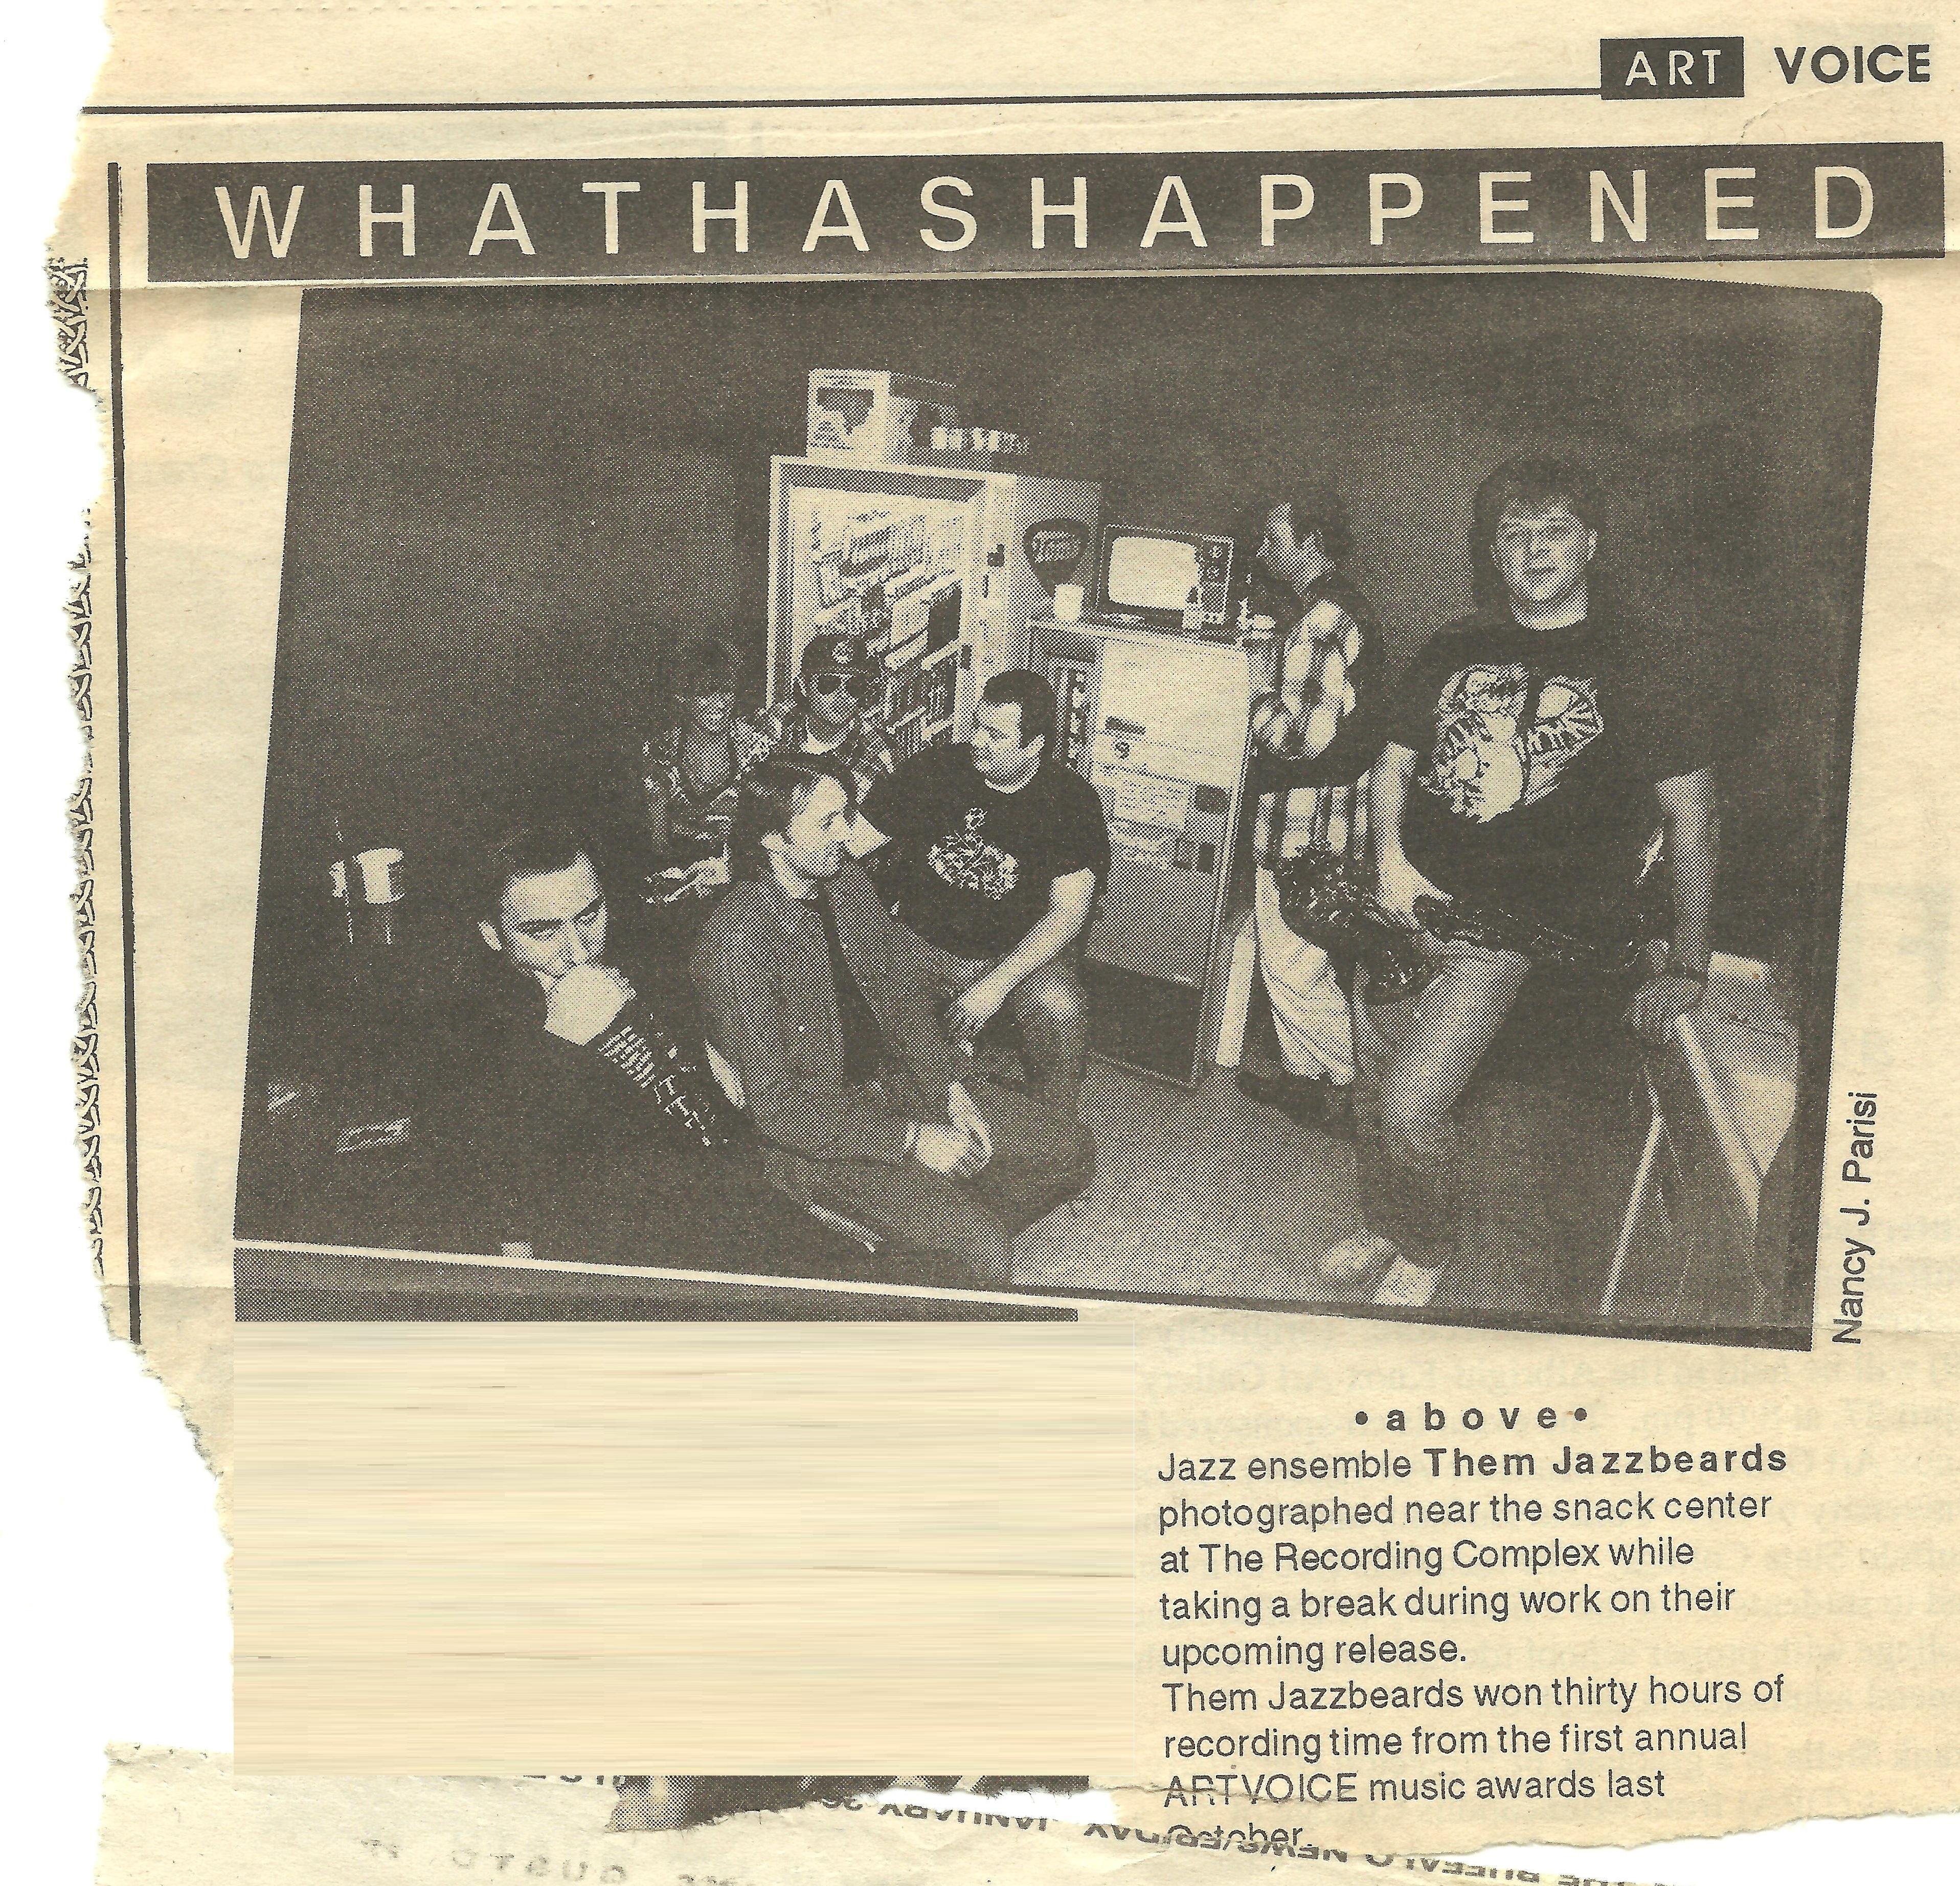 1.26.1996